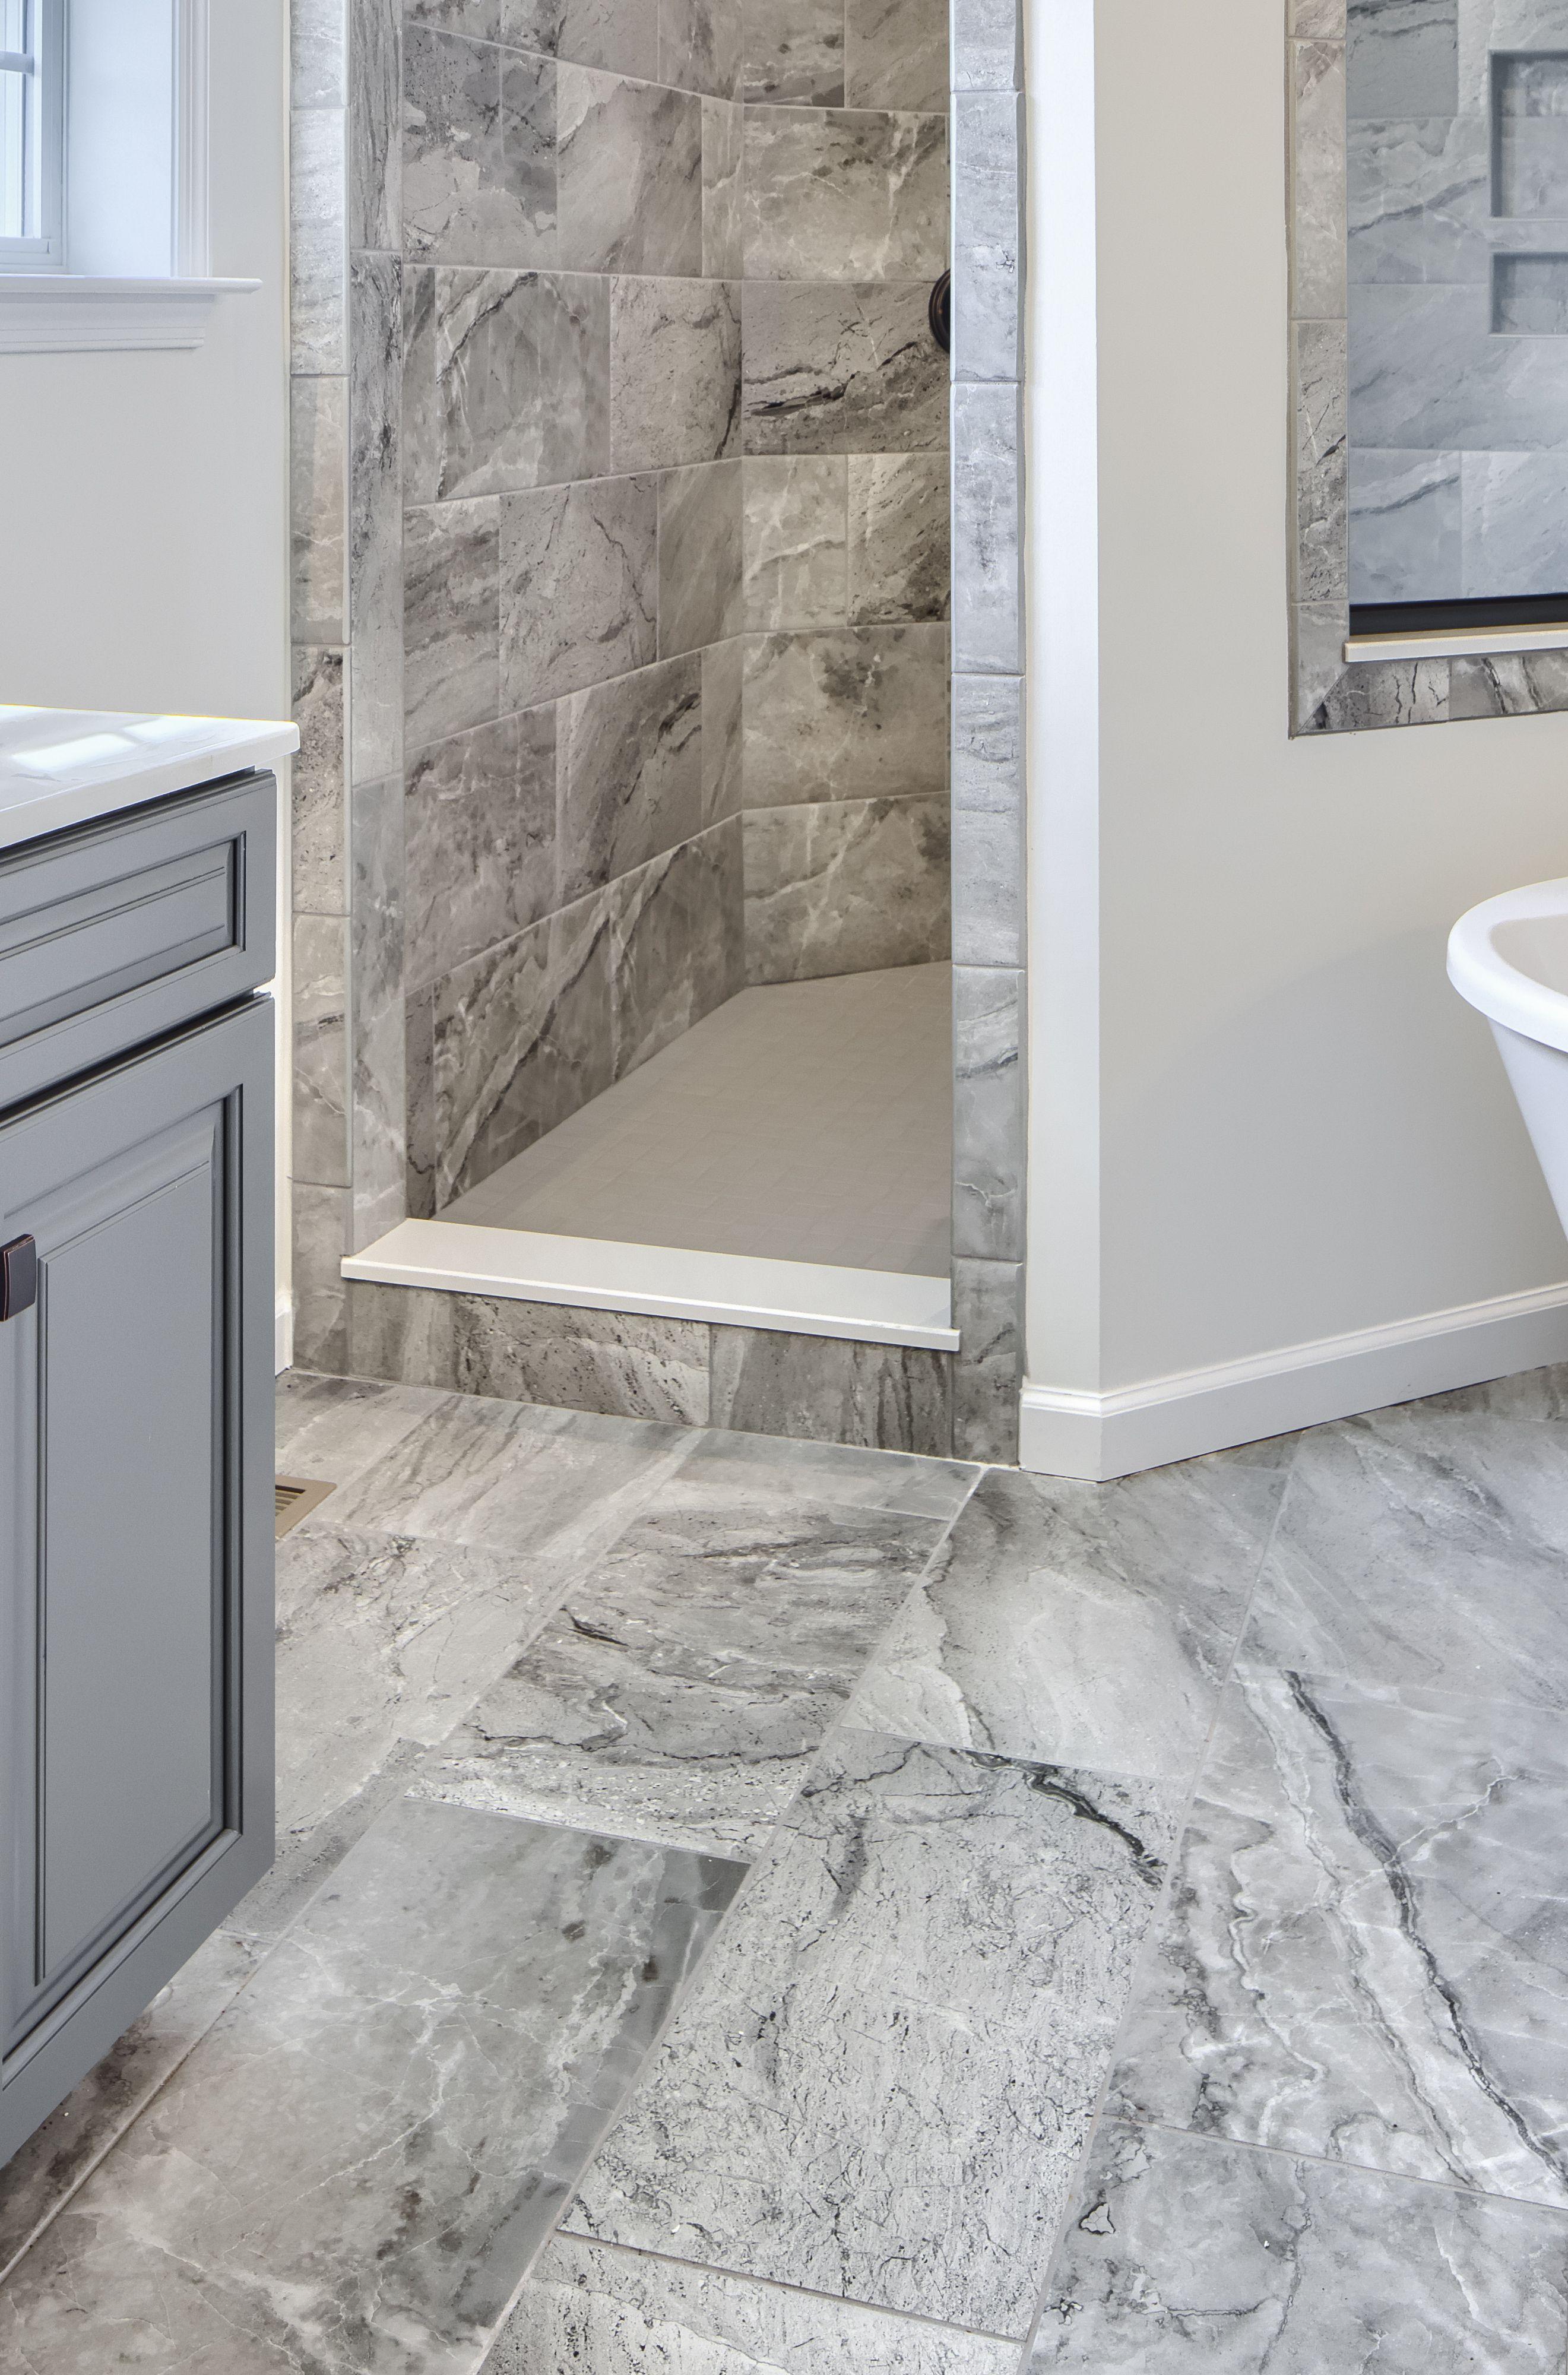 Bathroom featured in the Ethan Bordeaux By Keystone Custom Homes in Washington, MD